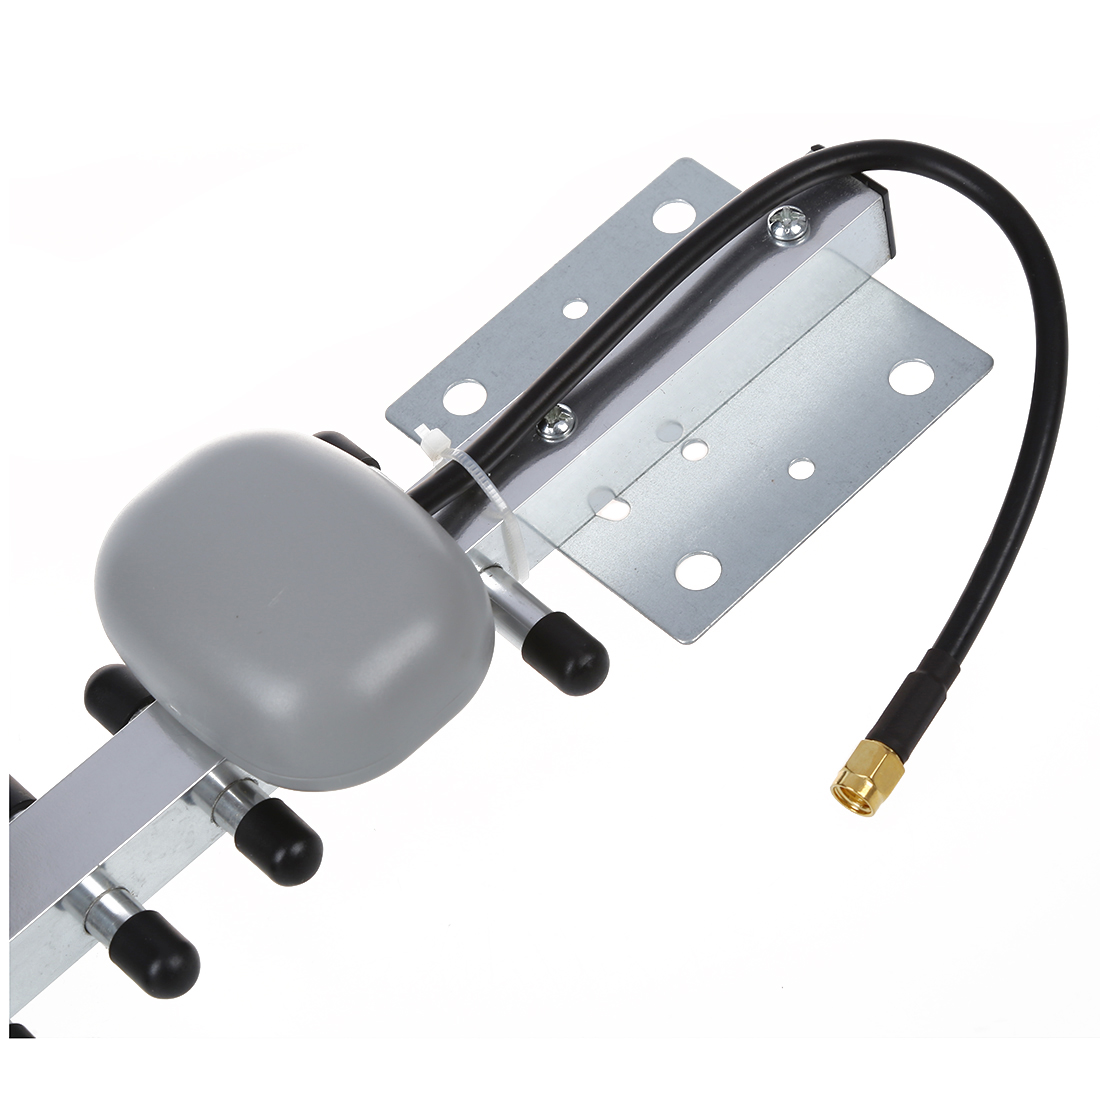 MOOL 2.4GHz 13DBI-15DBI Yagi WLAN WiFi Wireless Antenna for Router